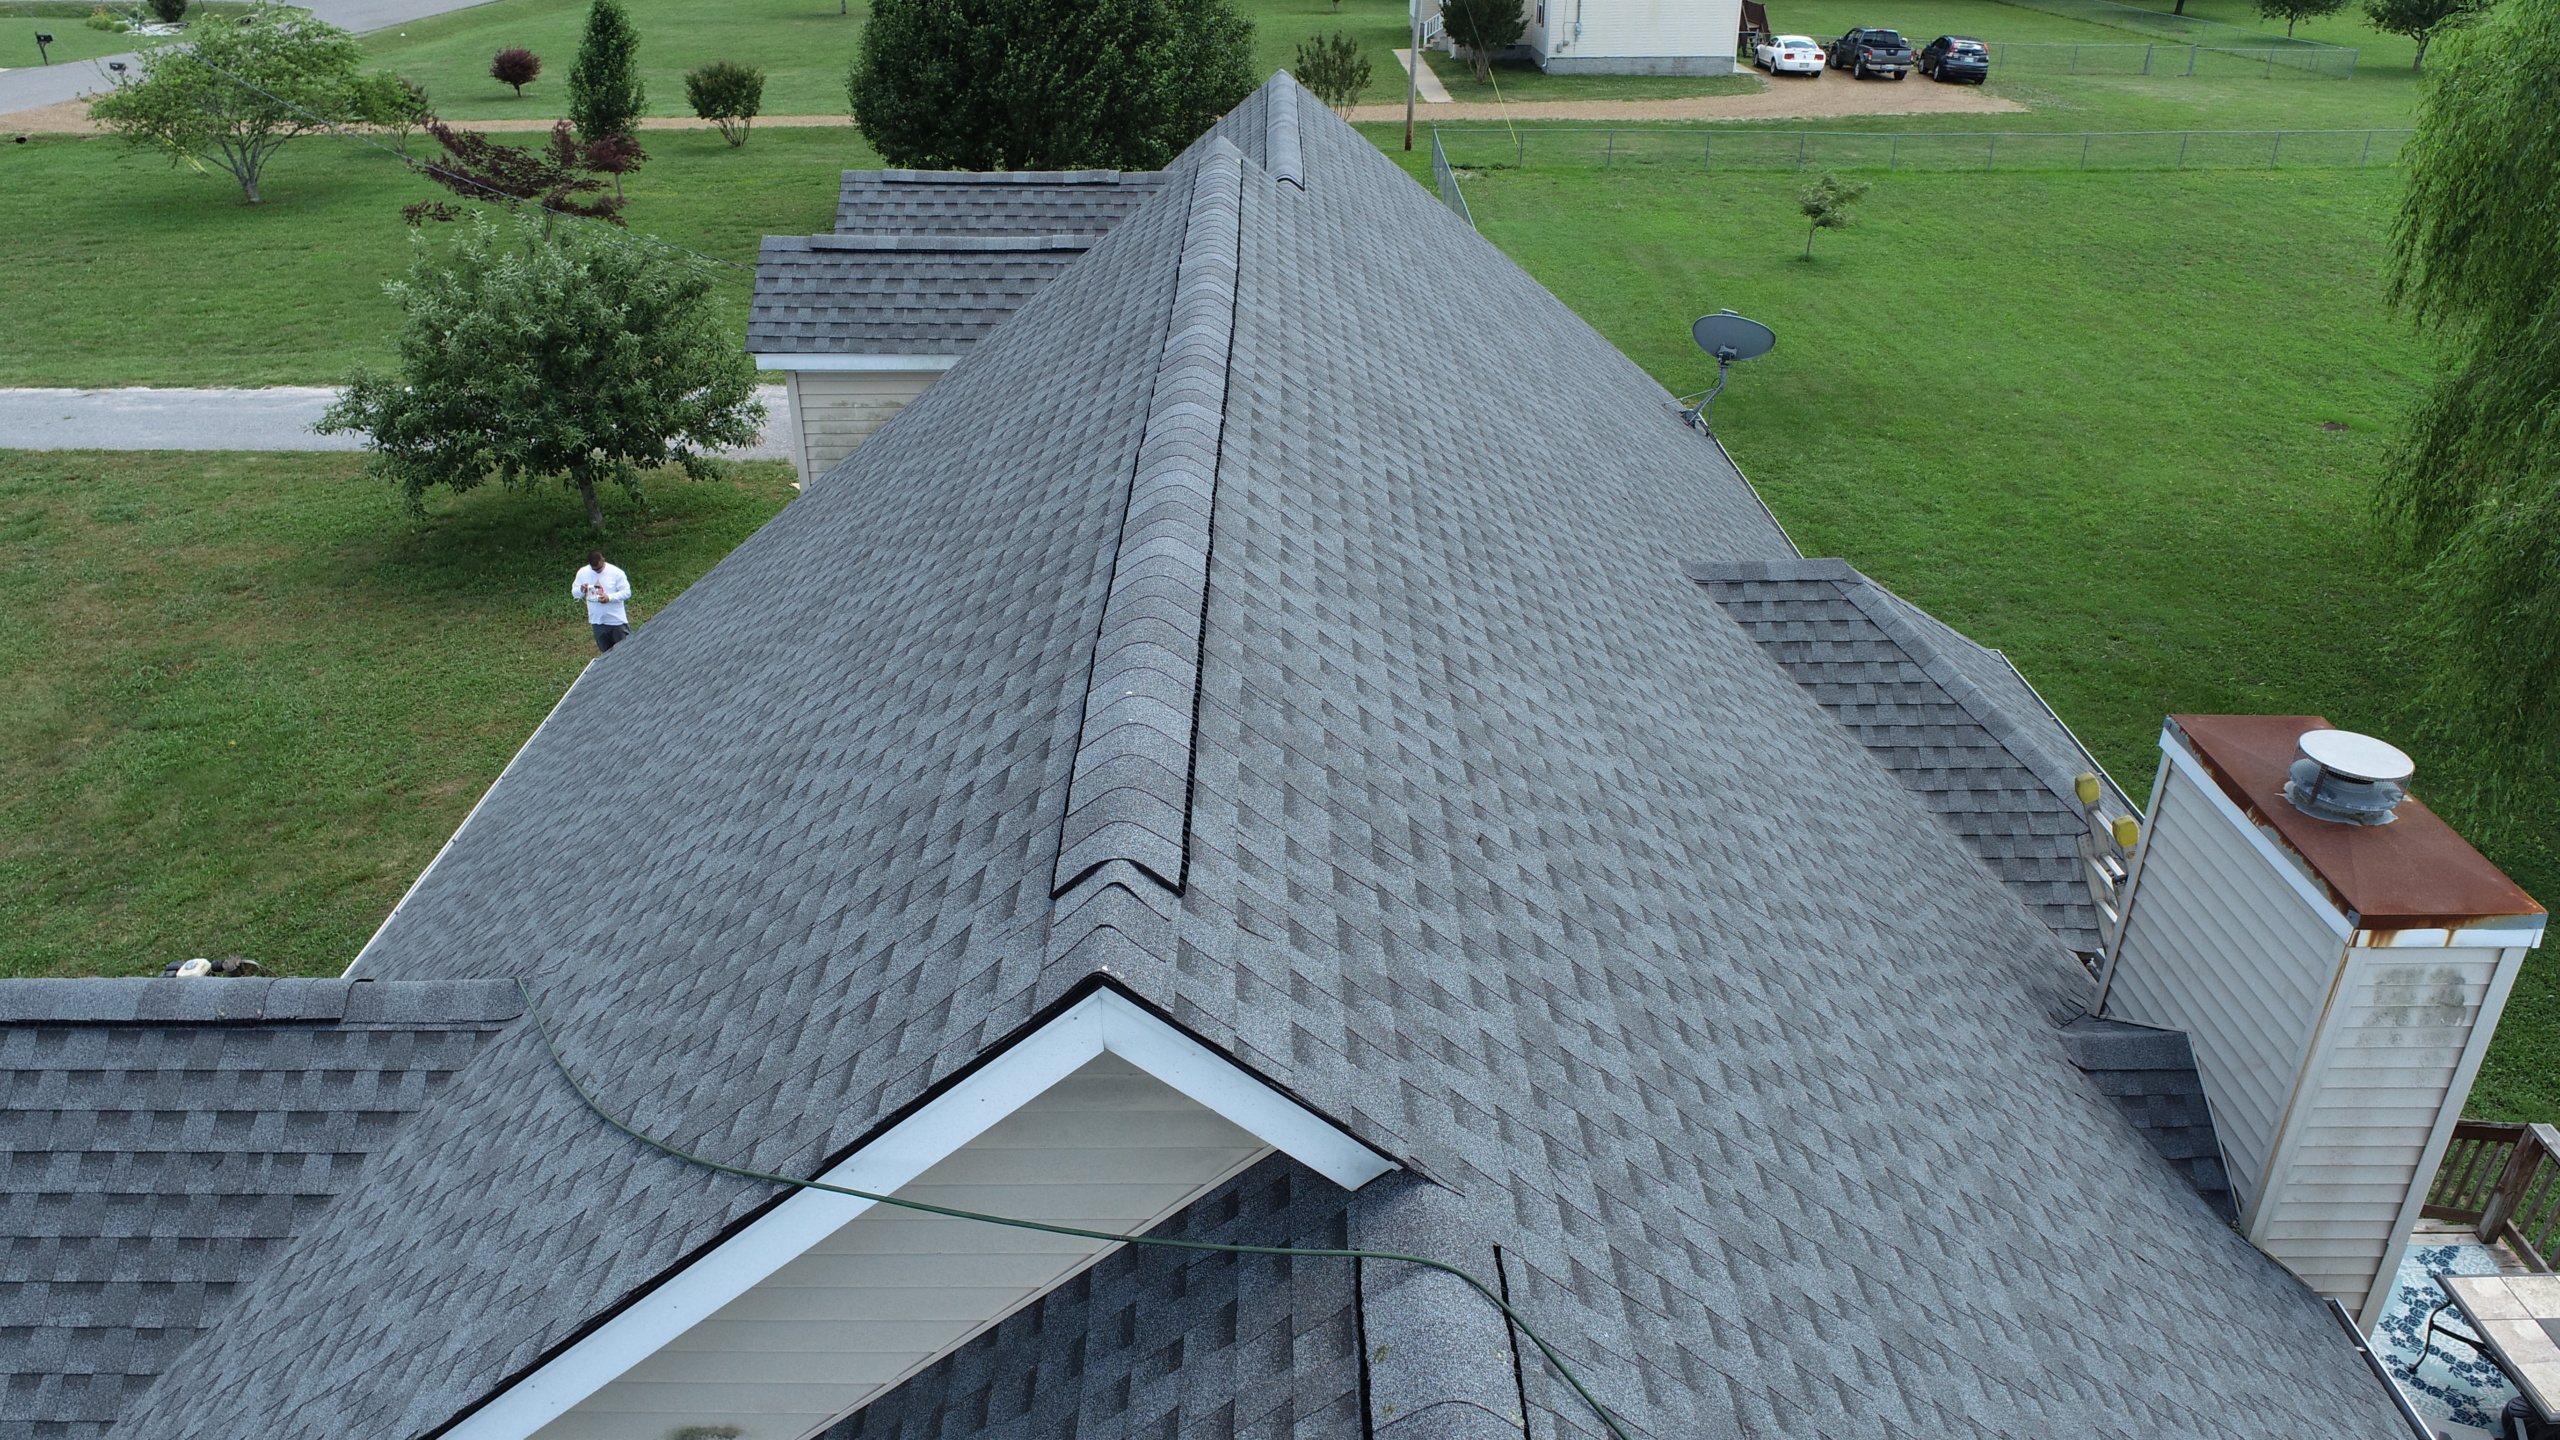 Roofing Murfreesboro GAF Pewter Gray Shingles 2